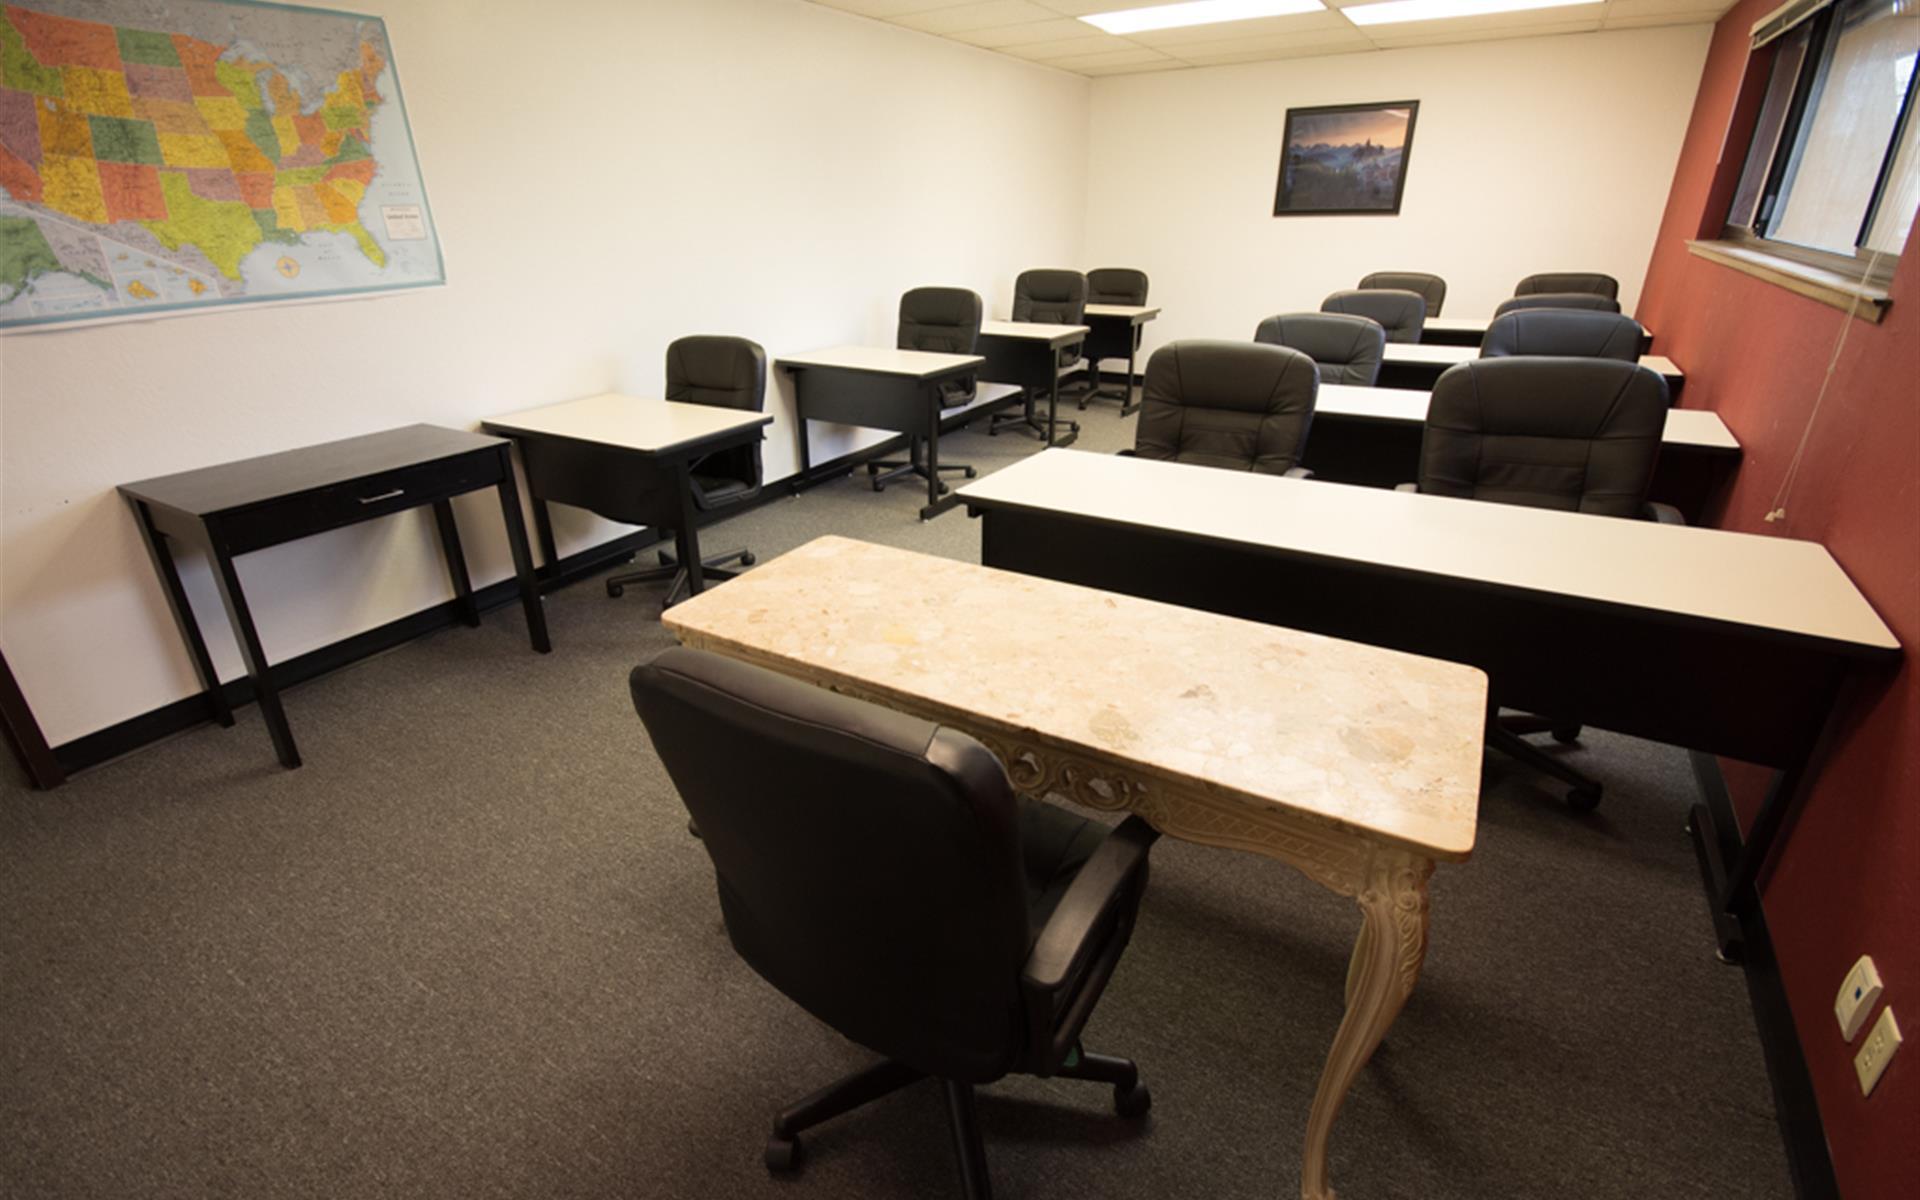 San Jose Learning Center - Large Studio Space